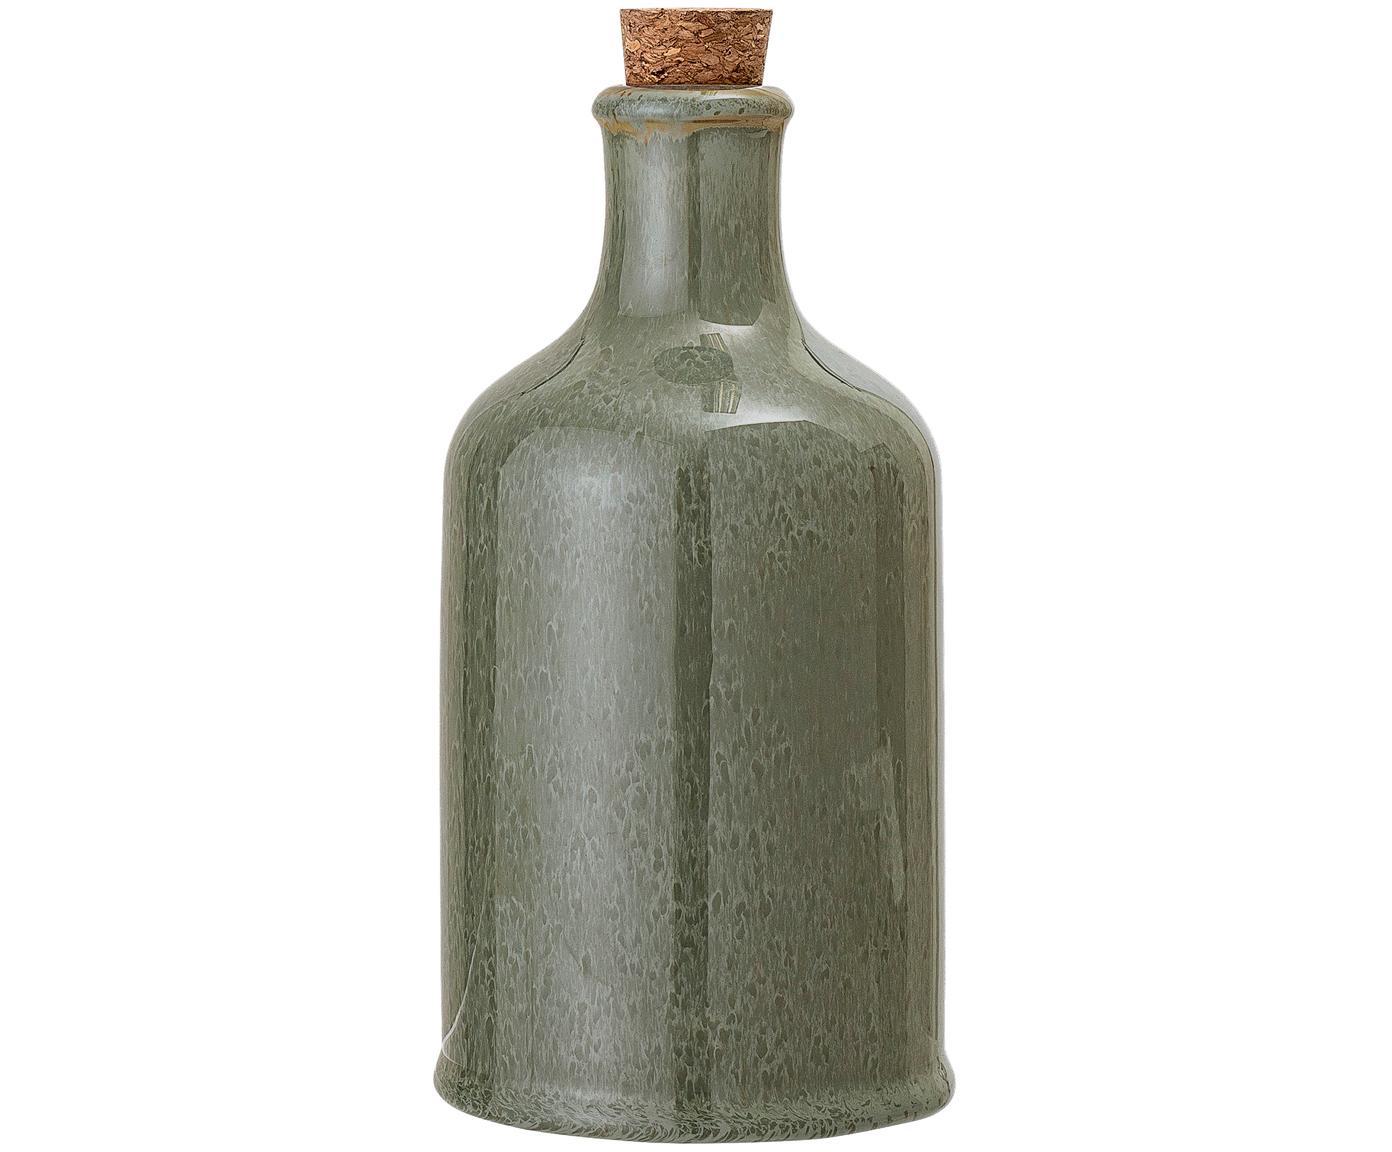 Olie- en azijnkaraf Pixie, Fles: keramiek, Groentinten, Ø 10 x H 19 cm